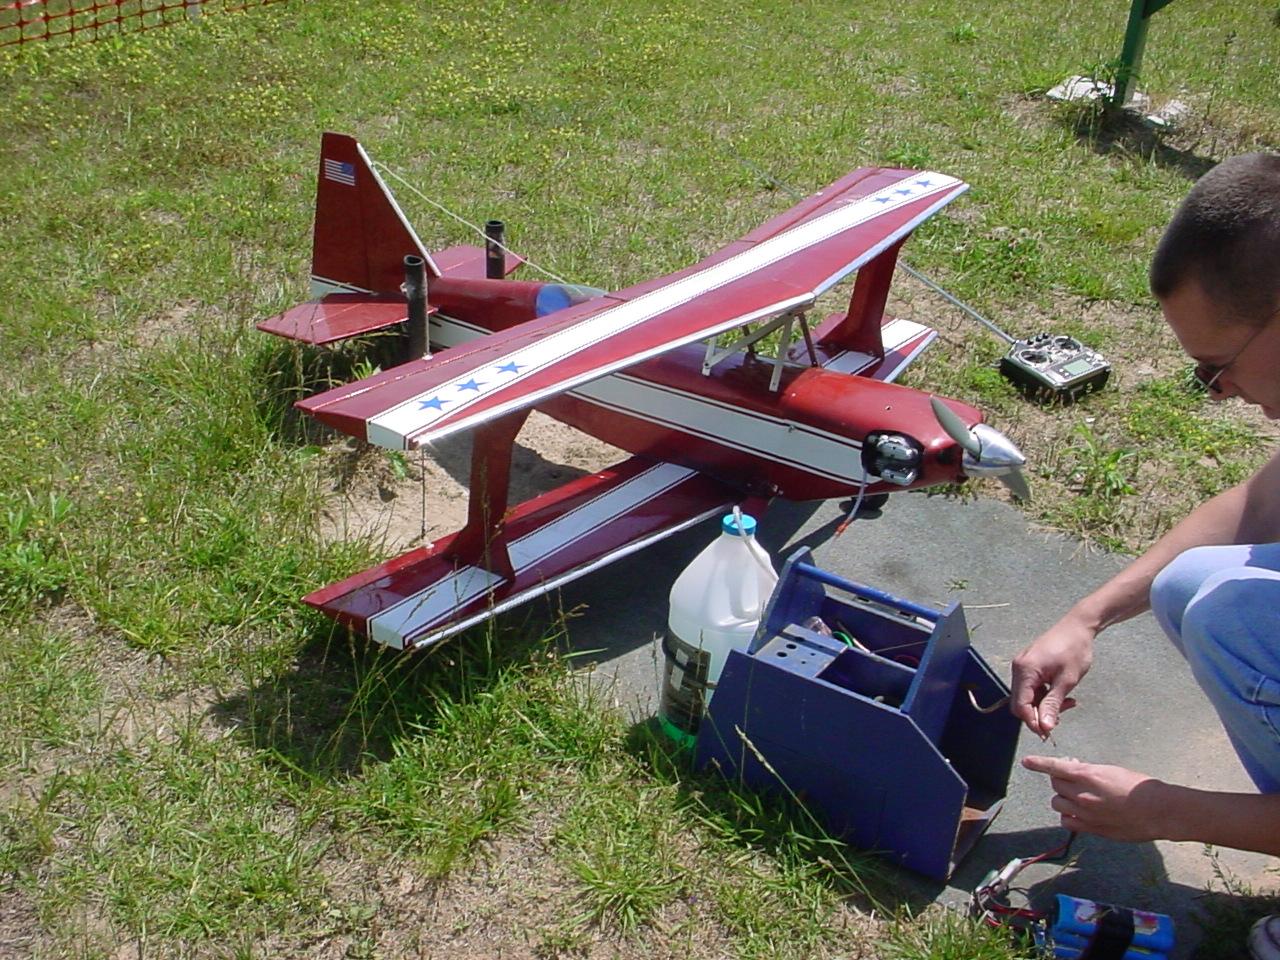 gliders-06-04-06-21